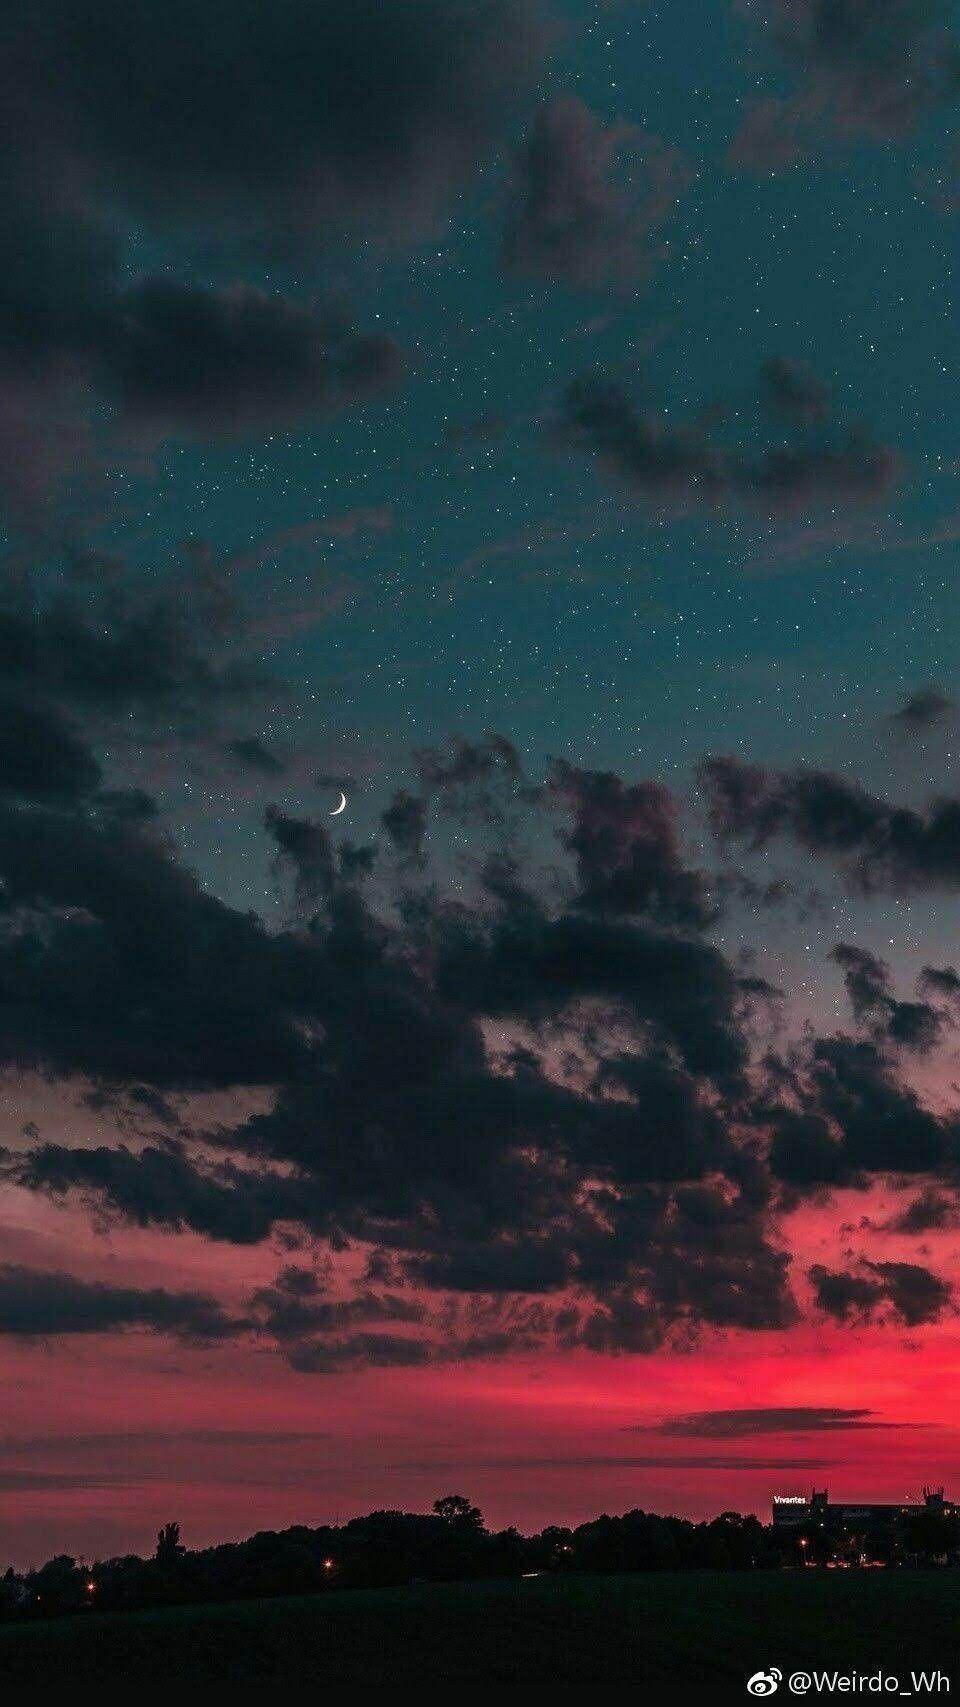 29 Fonds D Ecran Beautiful Cloud Pour Iphone Sky Aesthetic Background Hd Wallpaper Cloud Wallpaper